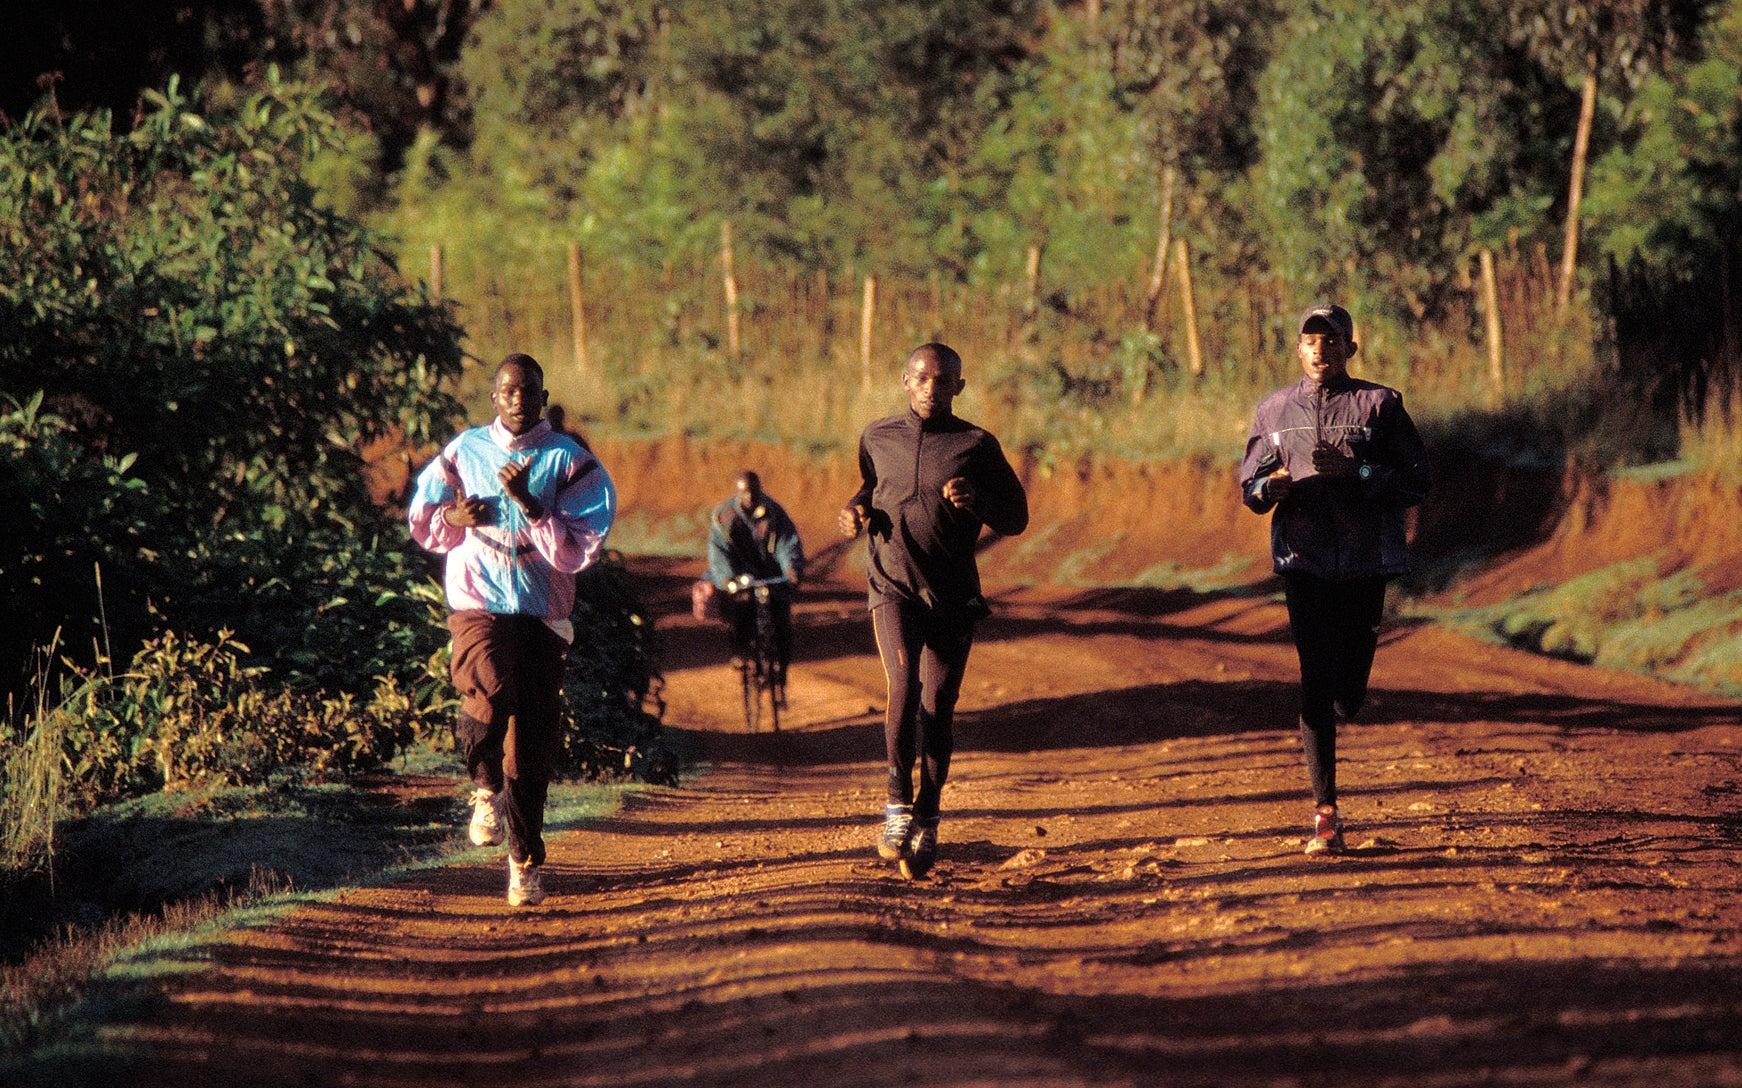 morning runners in Iten, Kenya